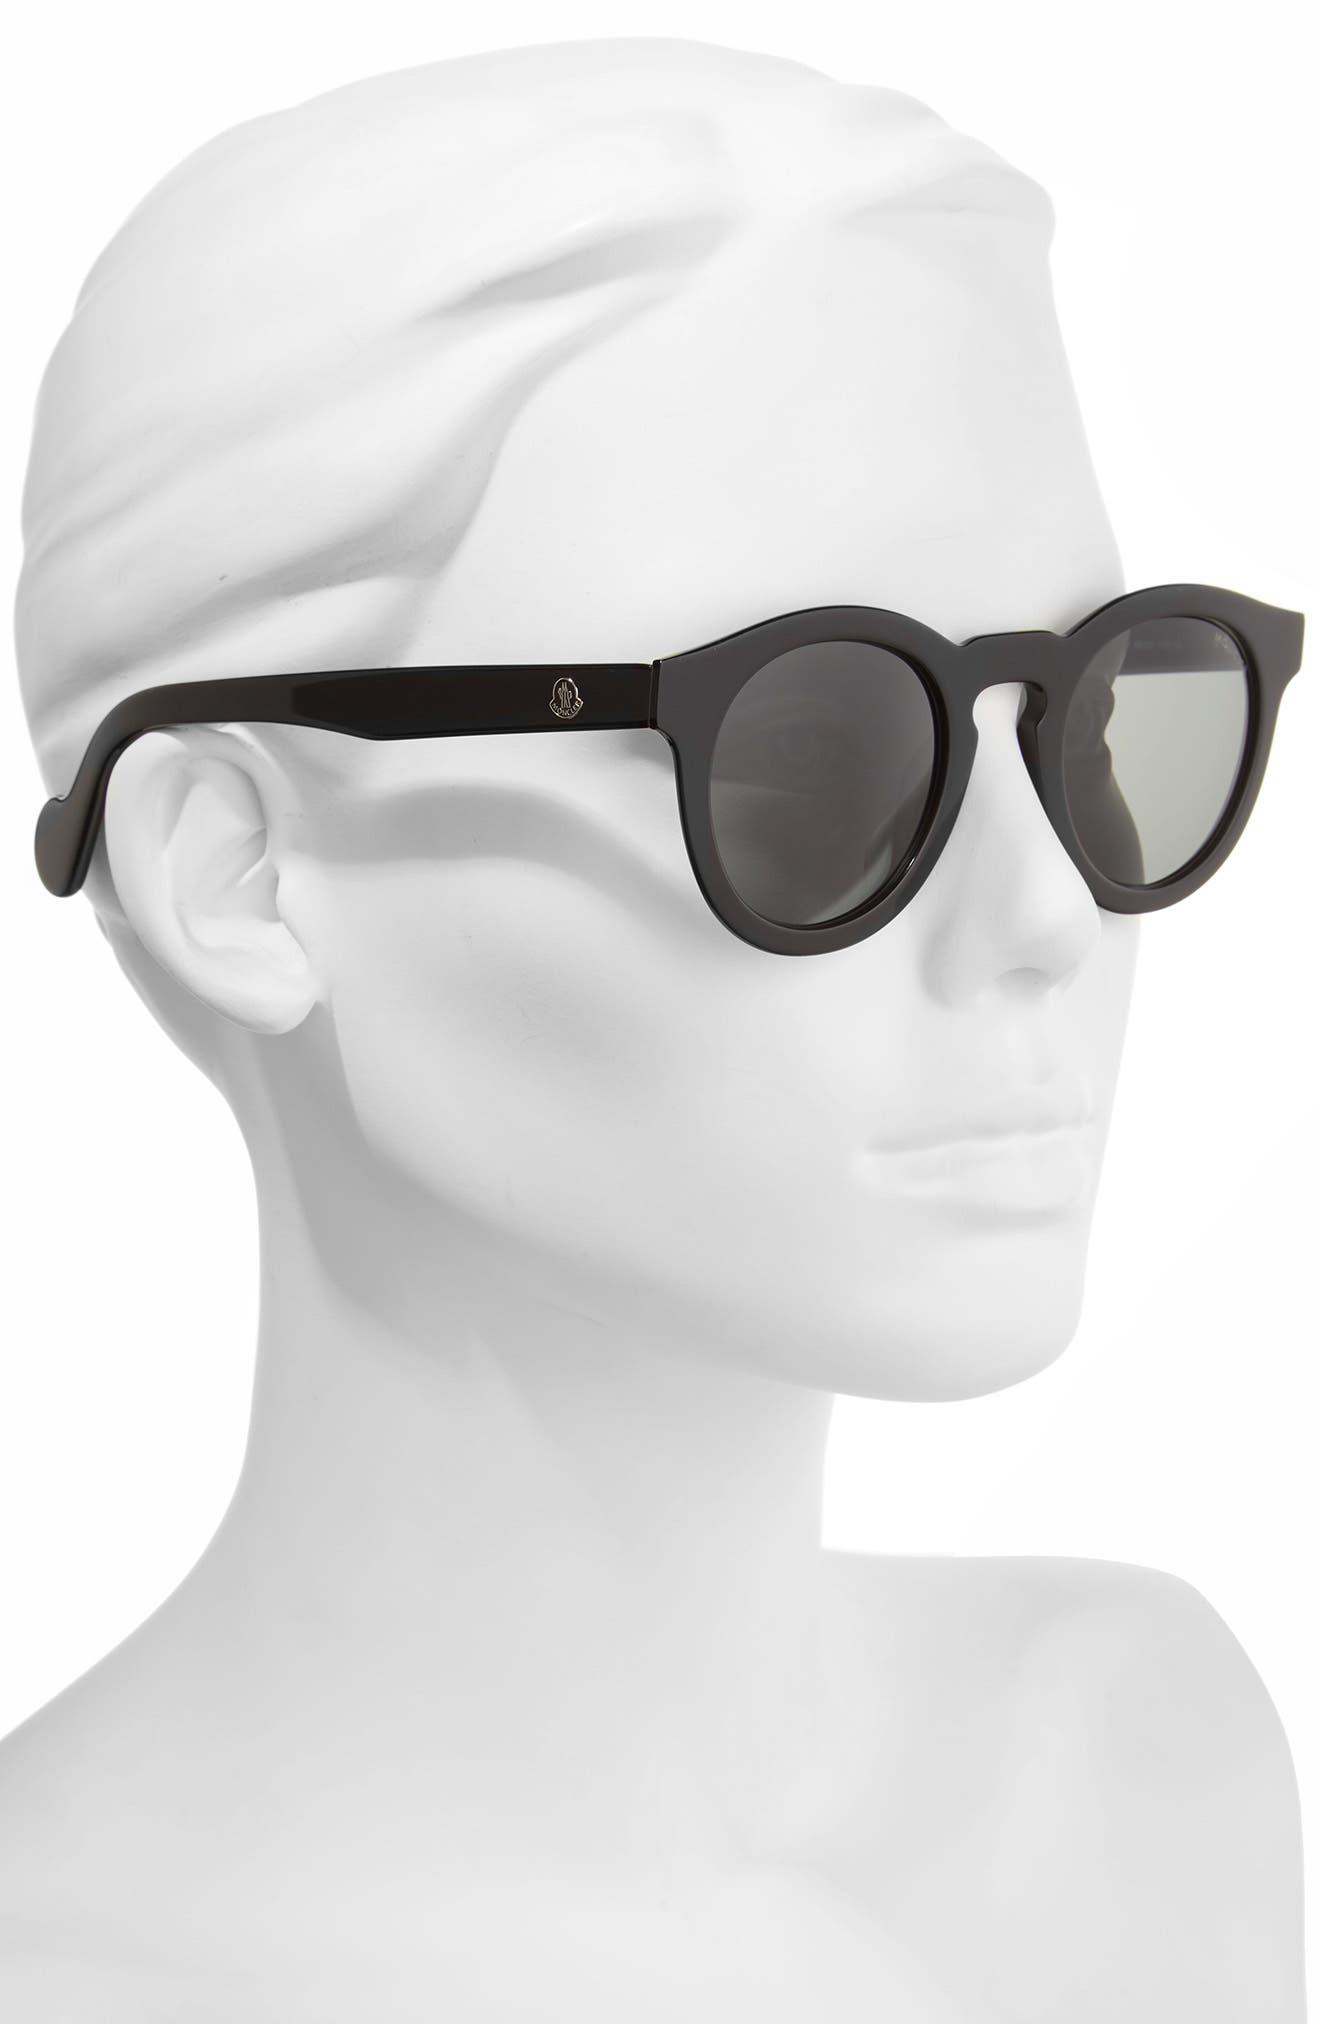 MONCLER,                             49mm Keyhole Sunglasses,                             Alternate thumbnail 2, color,                             001